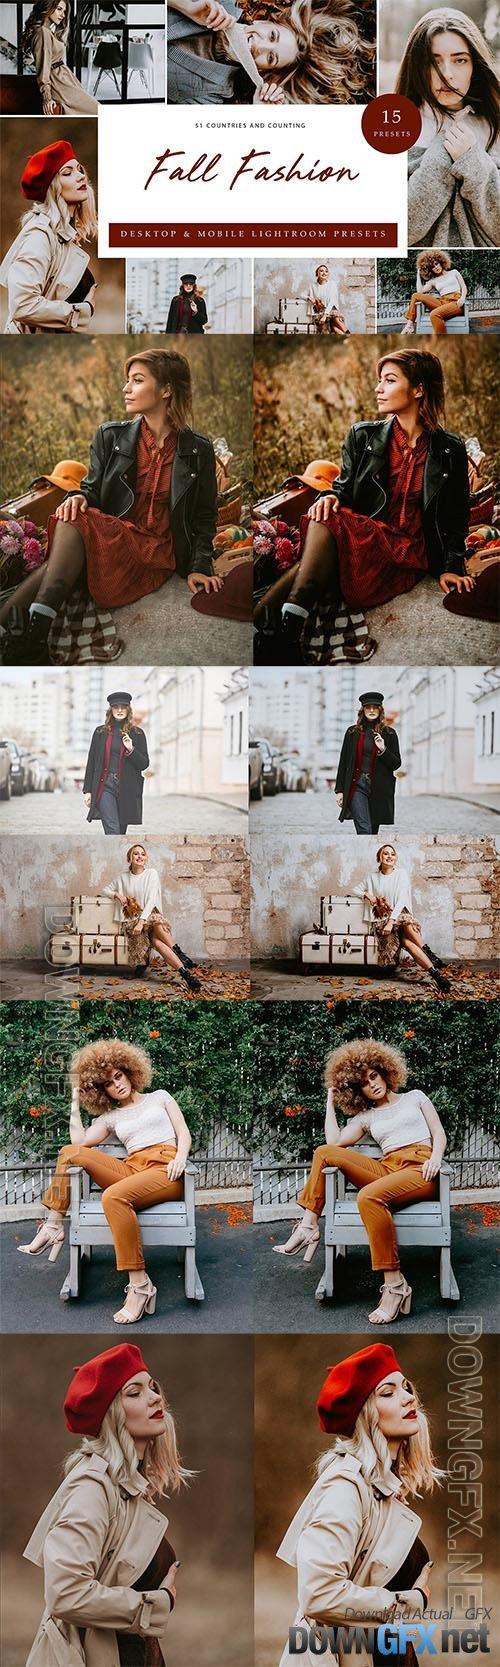 Lightroom Presets - Fall Fashion